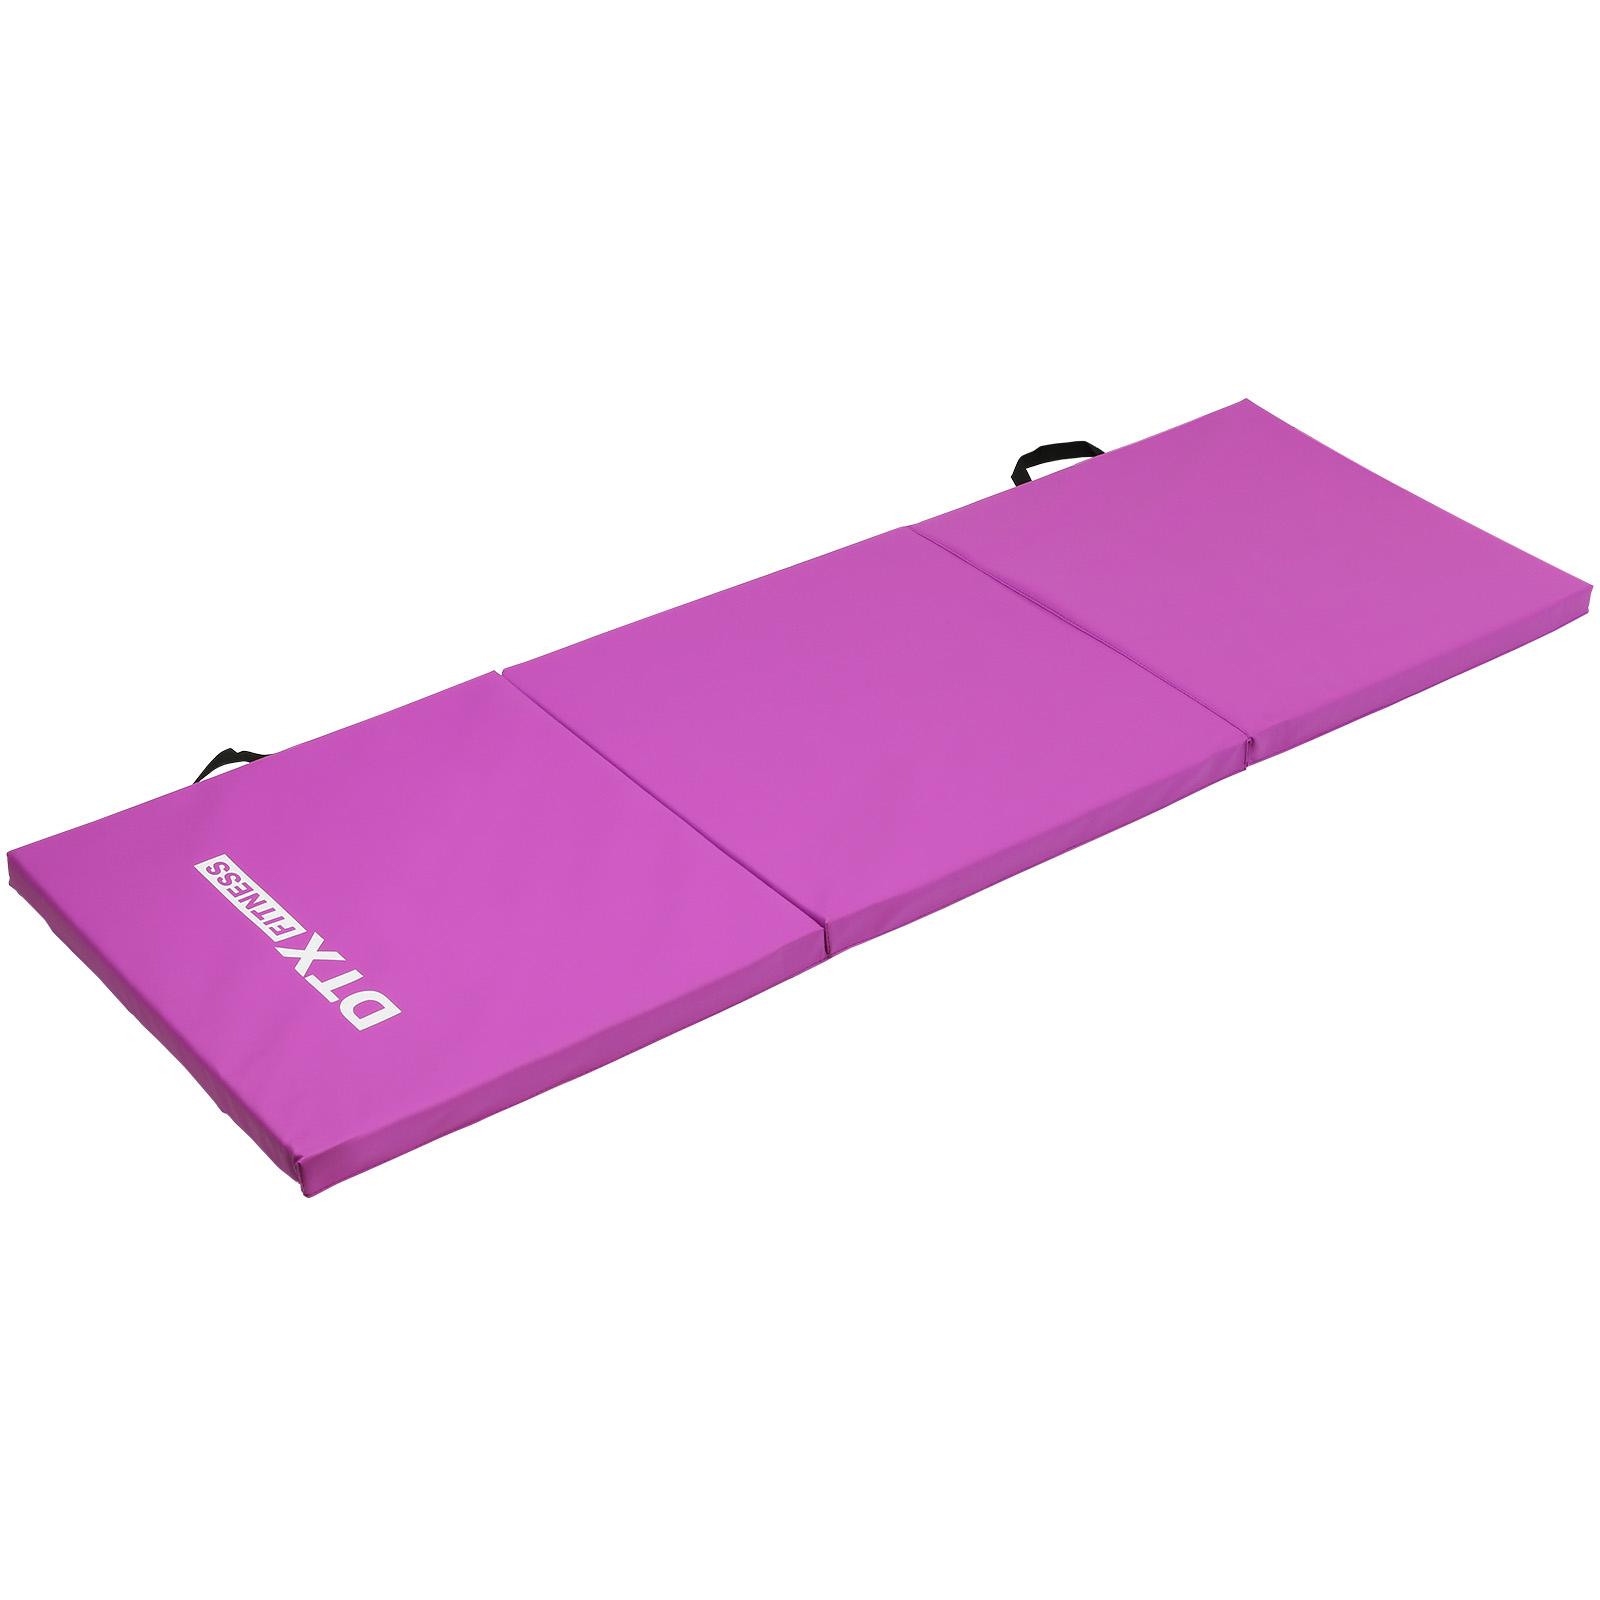 folding blue sports diy dp gymnastics nirosport mat amazon exercise gymnastic hinged uk co tumbling outdoors waterproof x mats